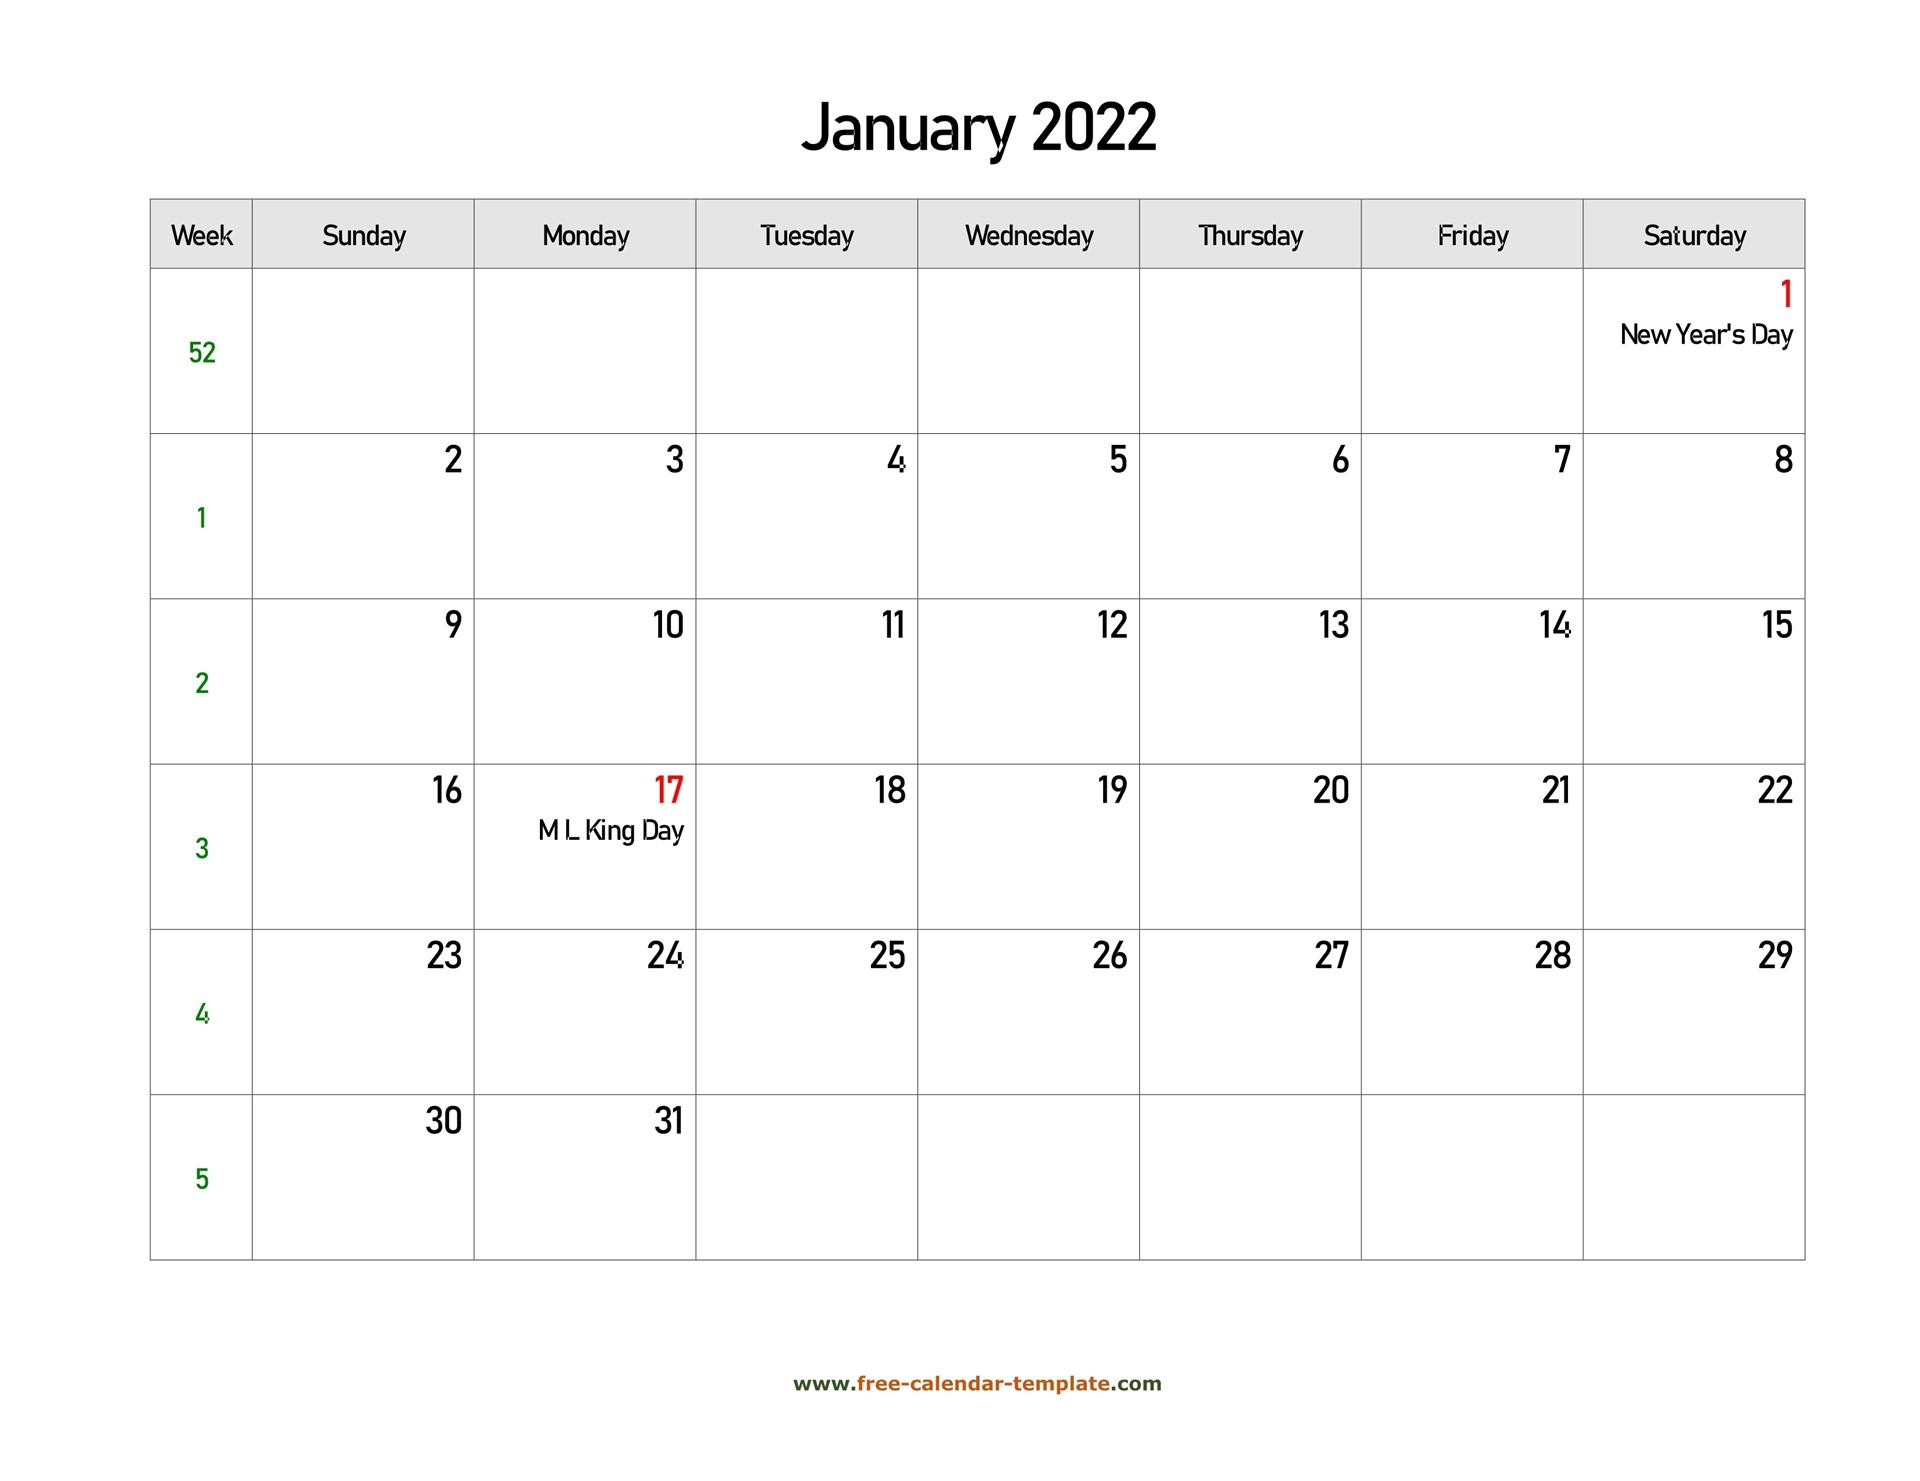 Free 2022 Calendar Blank January Template (Horizontal Throughout Blank January 2022 Calendar